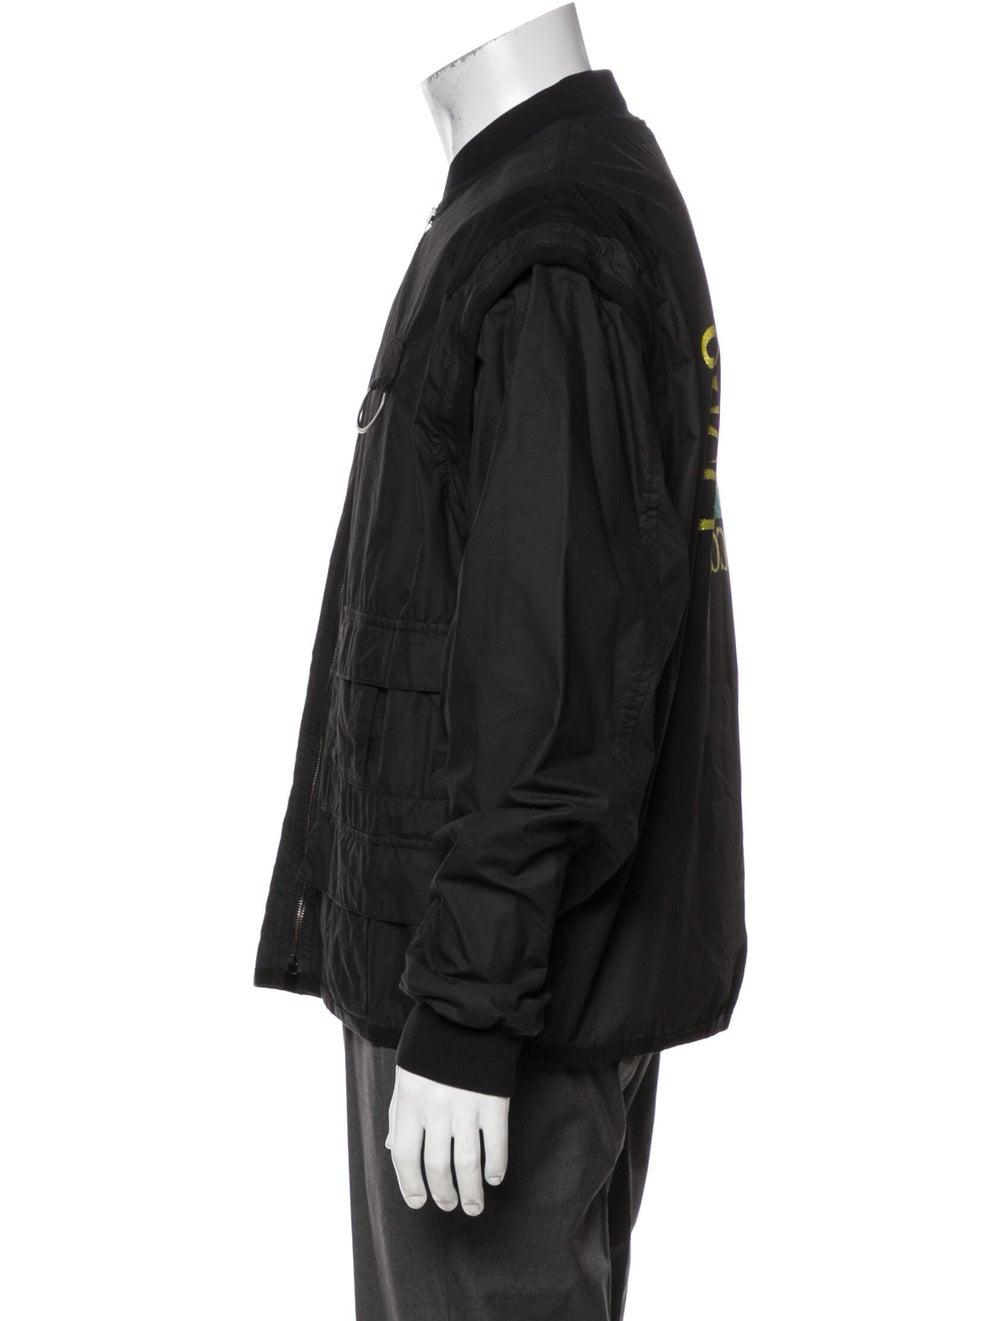 Gucci 2019 Bomber Jacket Black - image 2